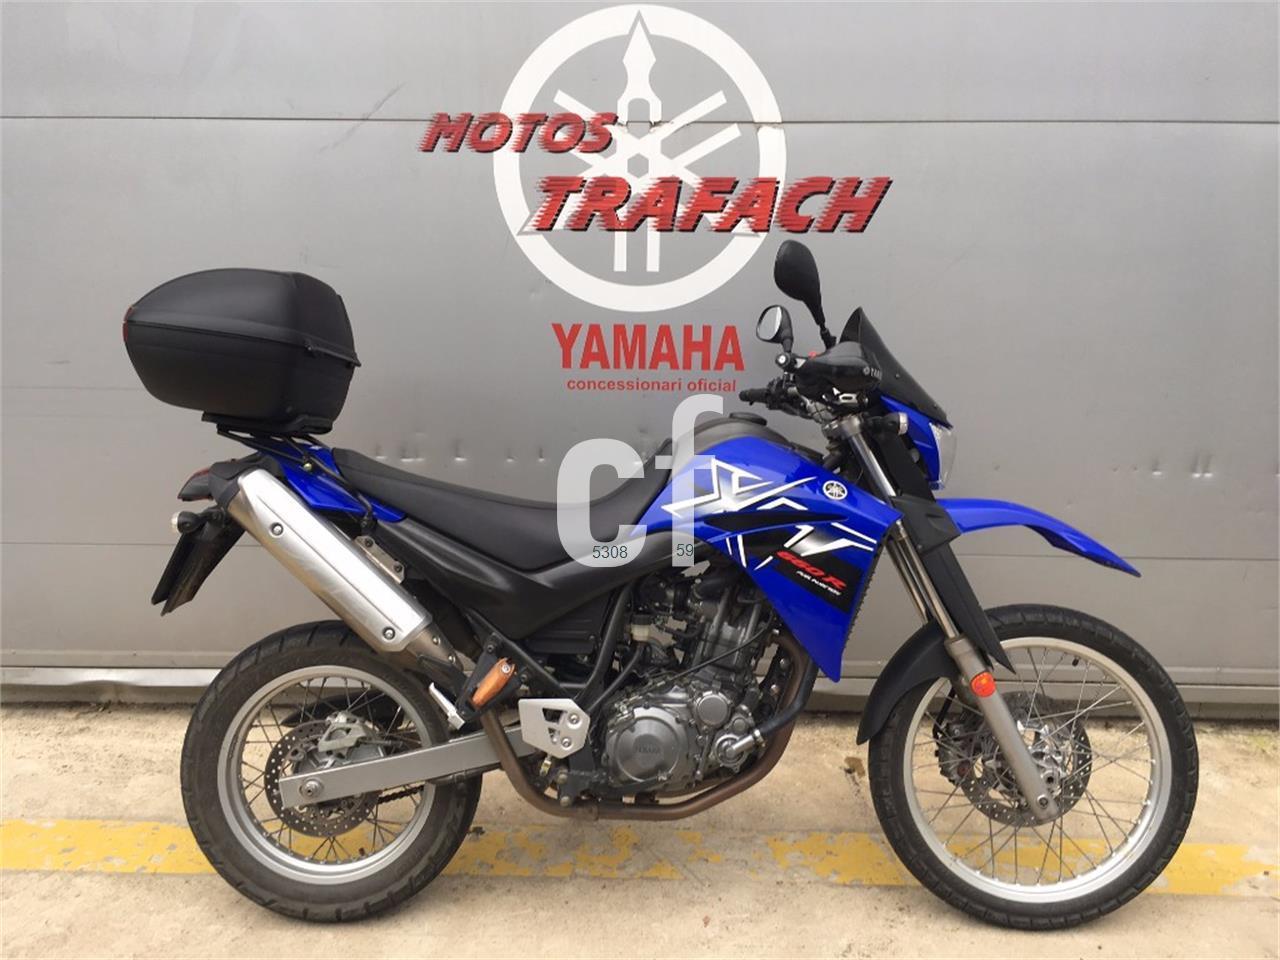 YAMAHA XT 660 R de venta